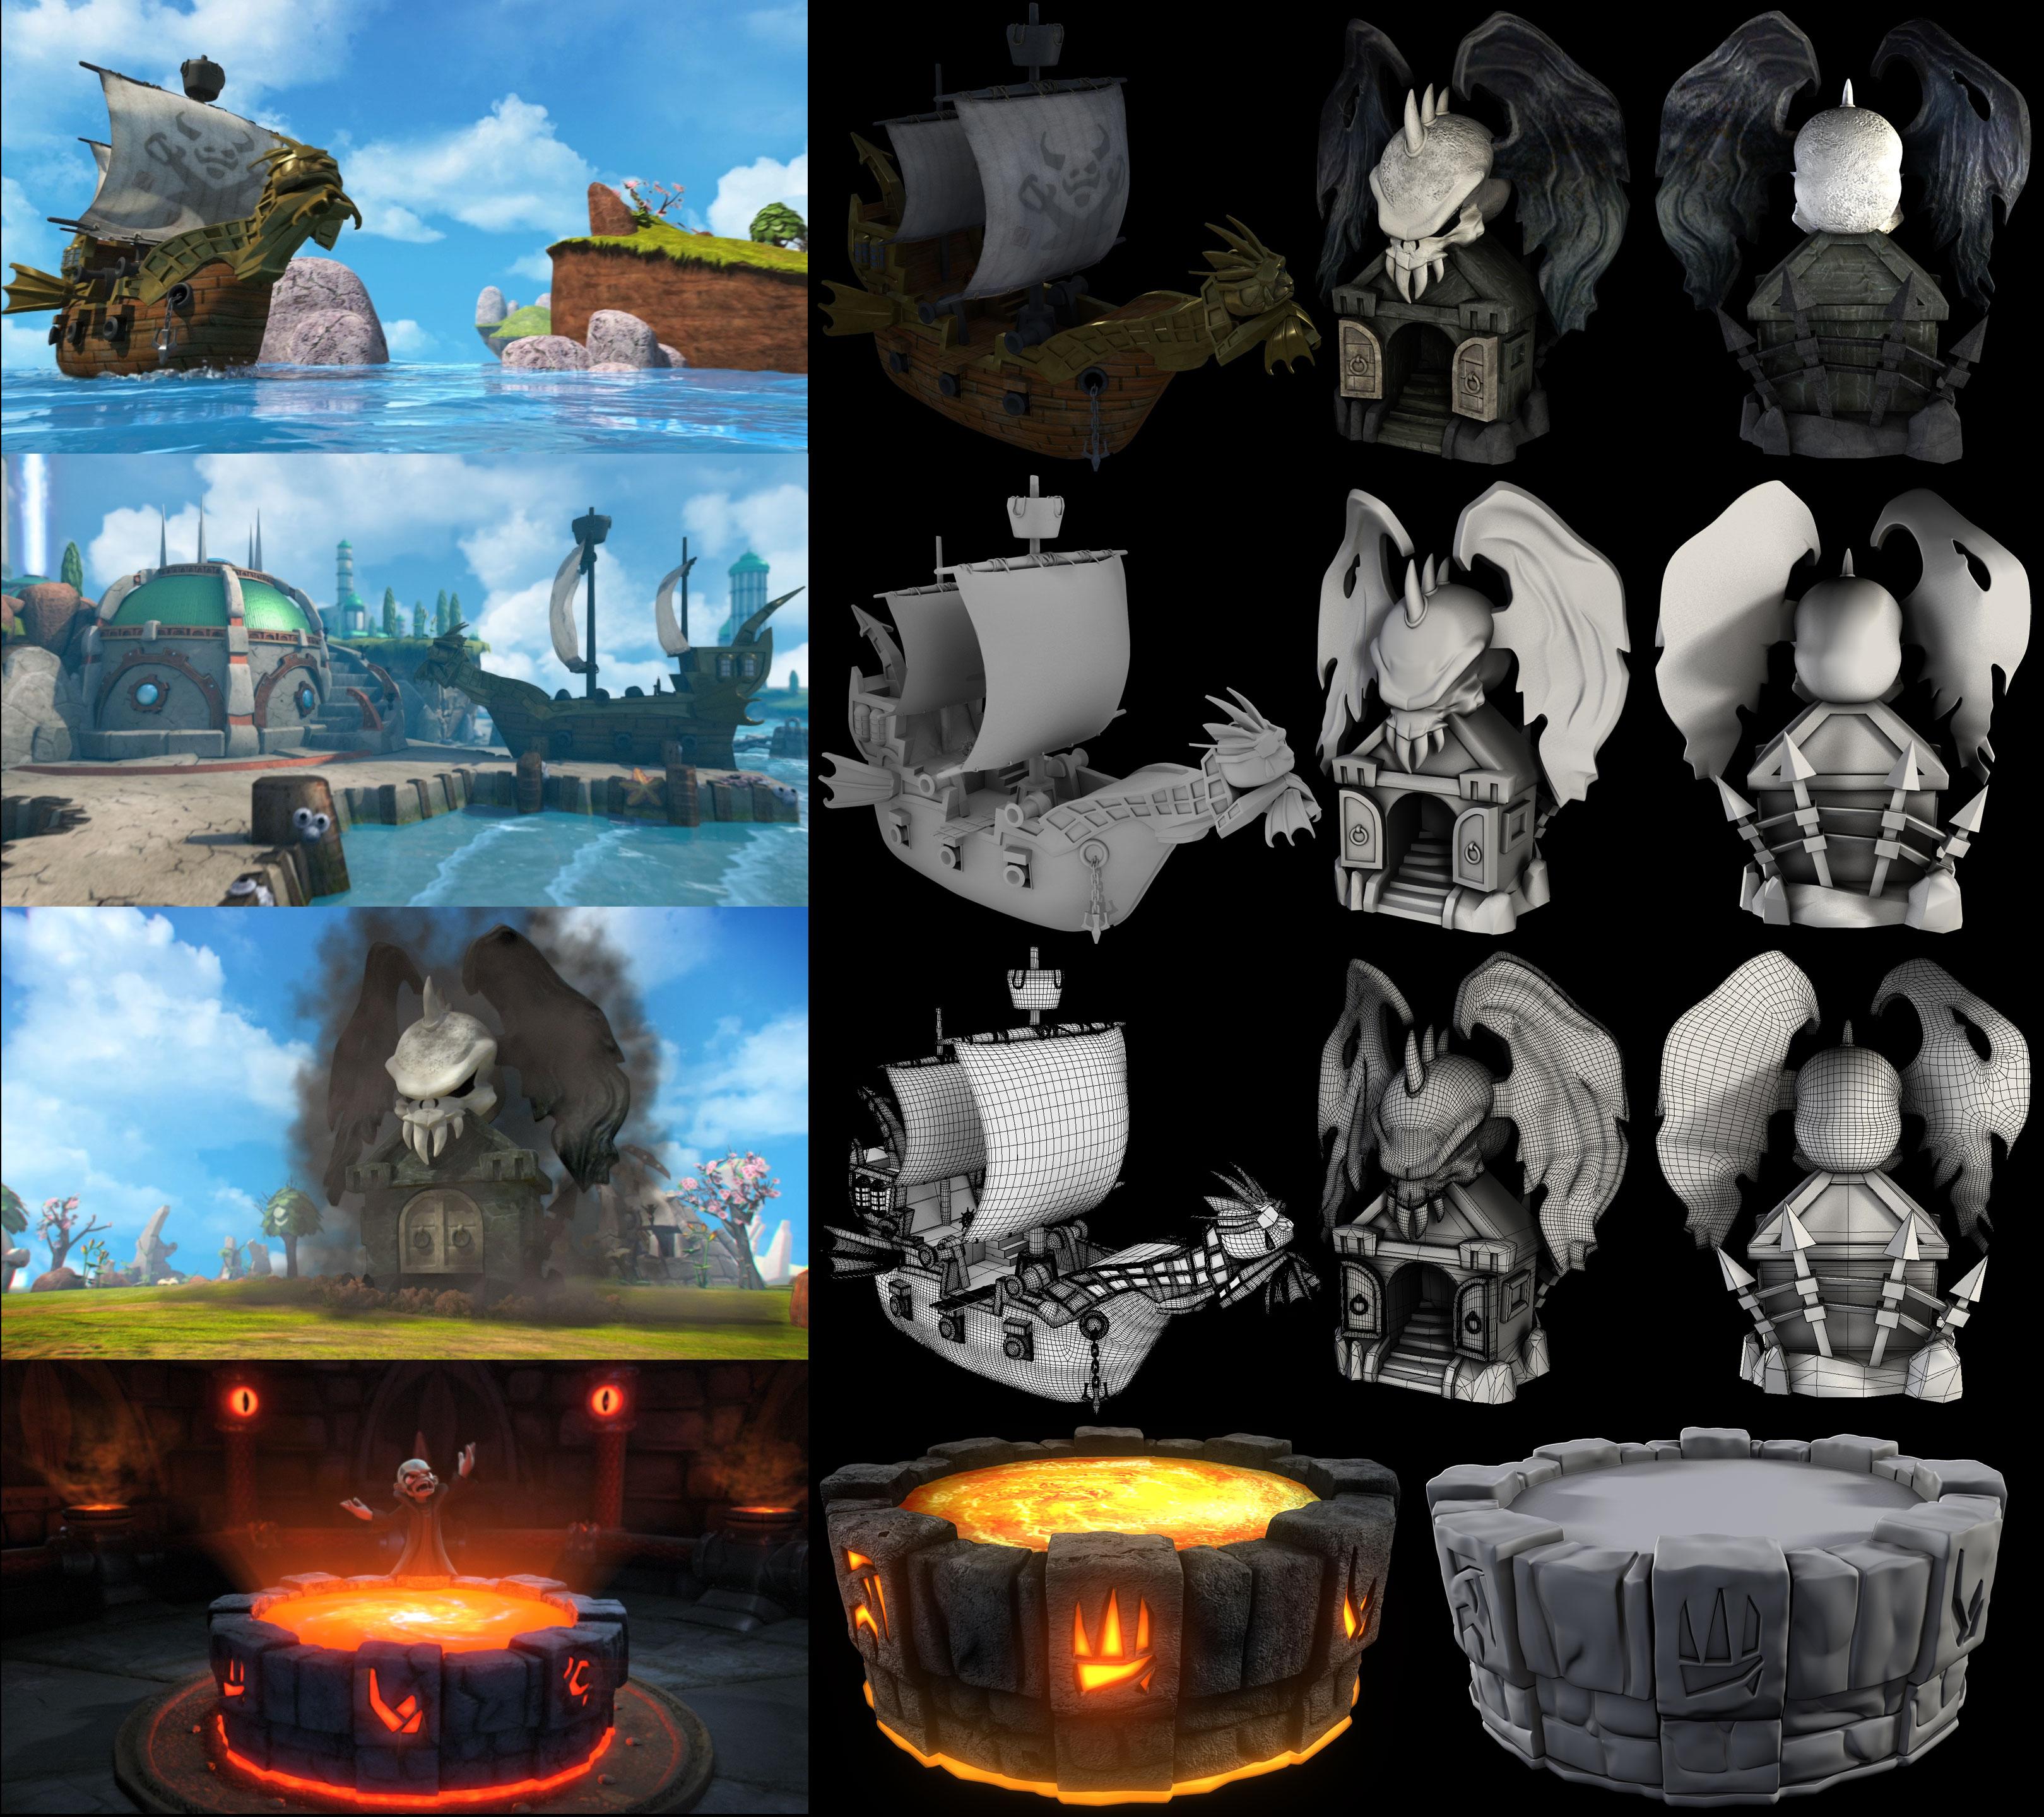 Skylanders game cinematics by Artsomniac